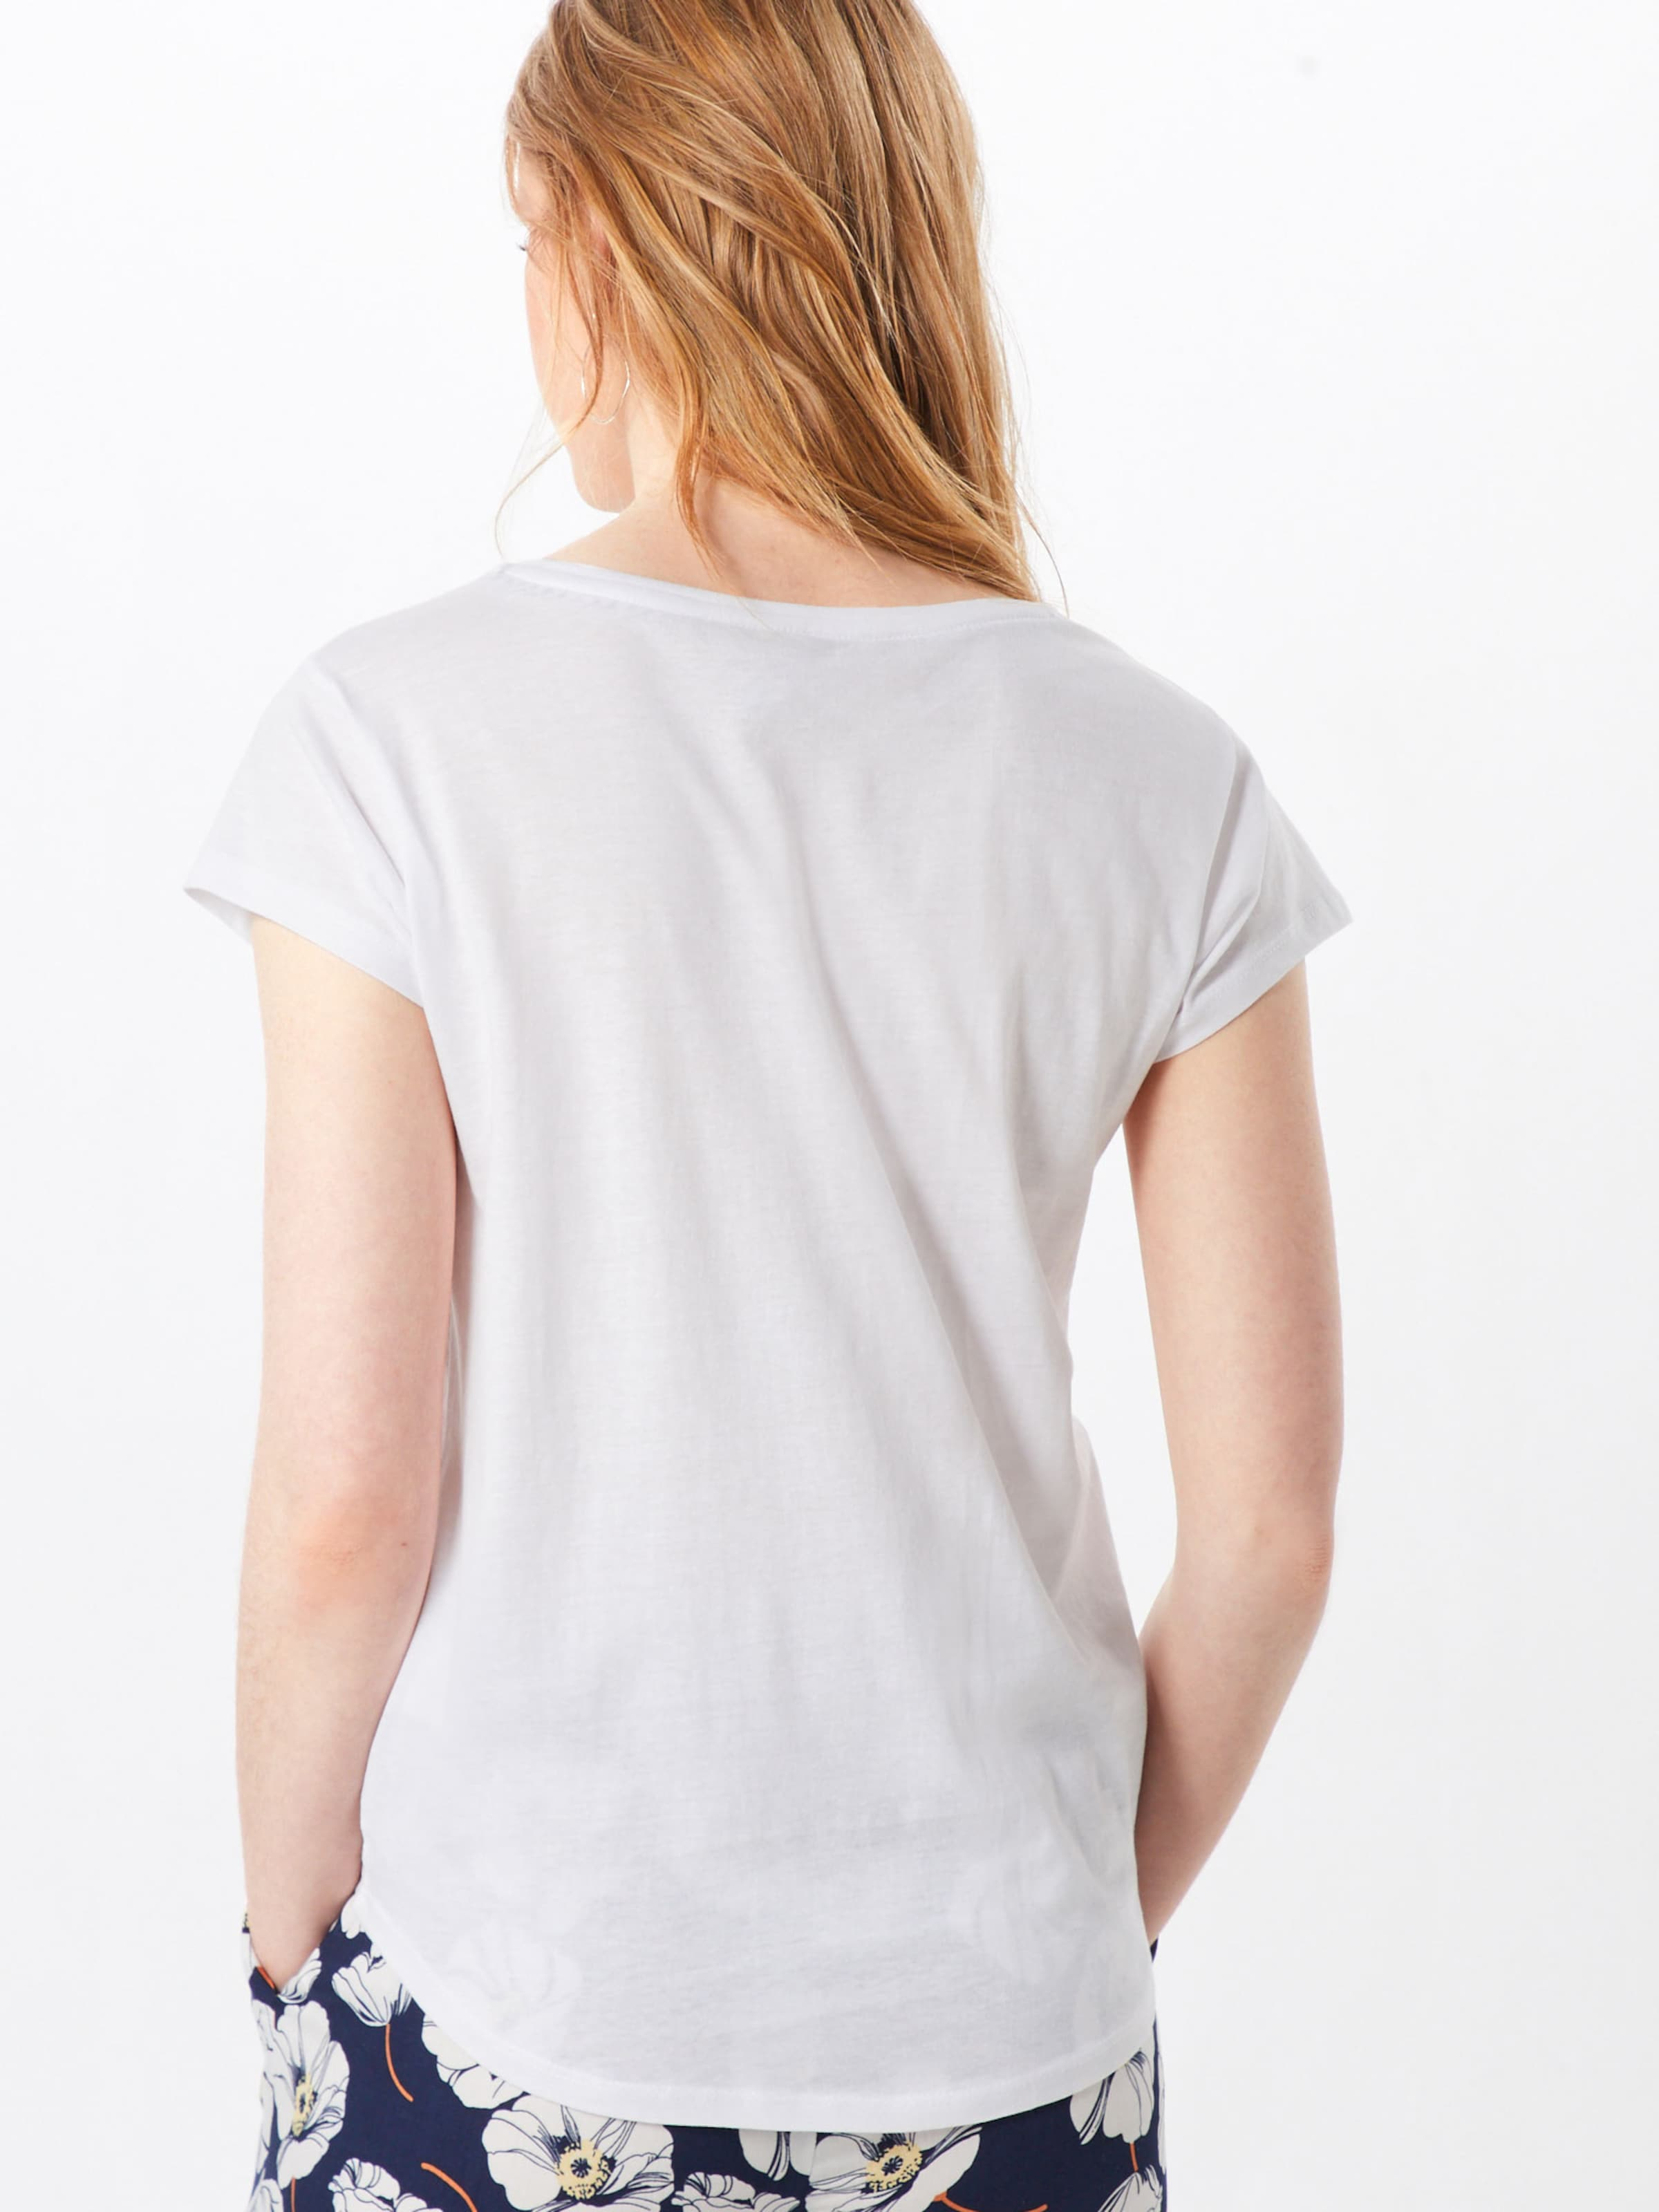 In 'elli' Shirt 'elli' Hailys MischfarbenOffwhite Hailys Shirt sCtrdQh